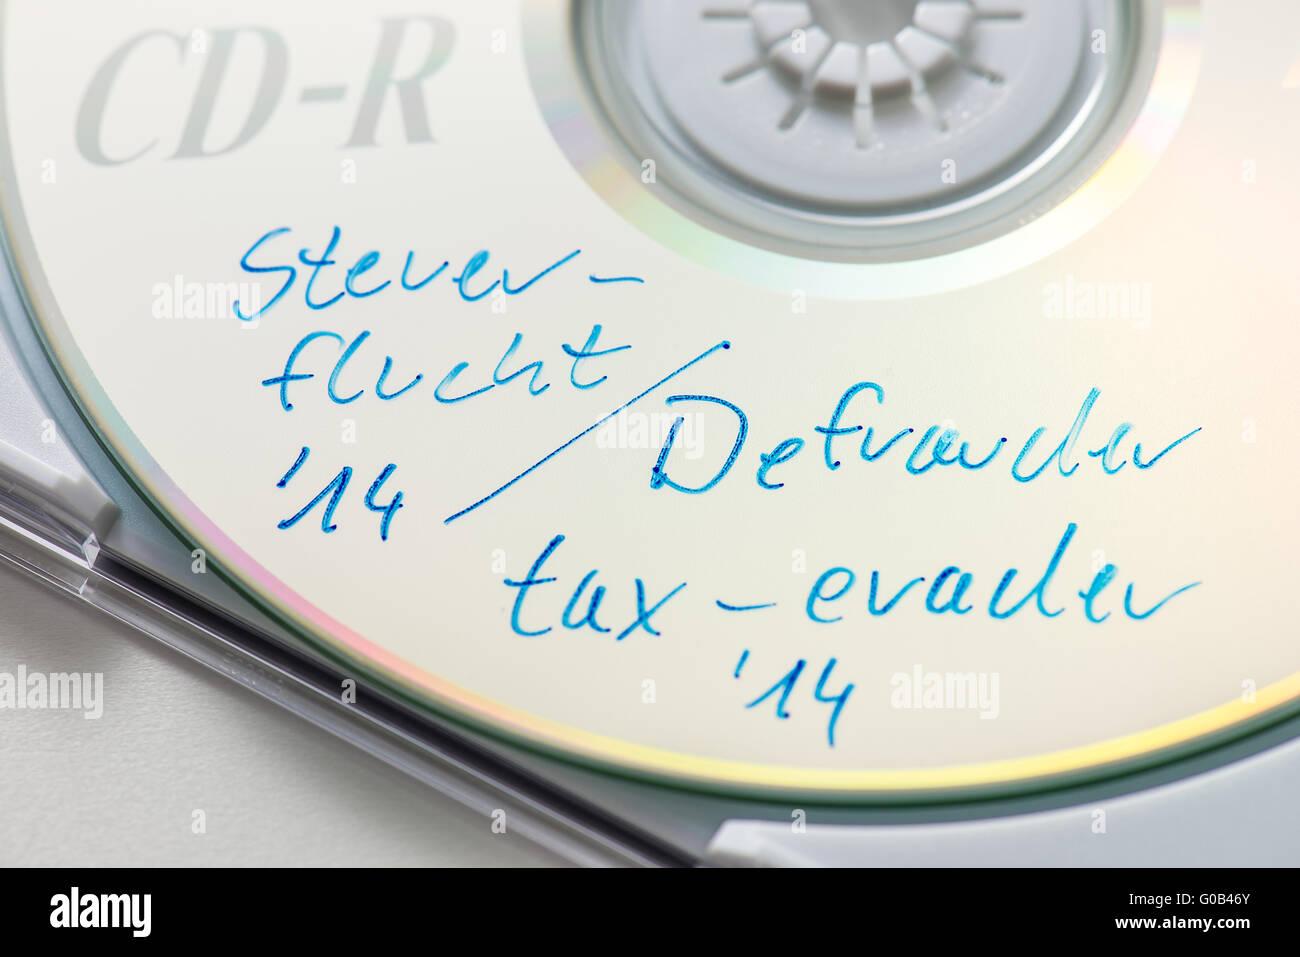 Tax evasion CD - Stock Image